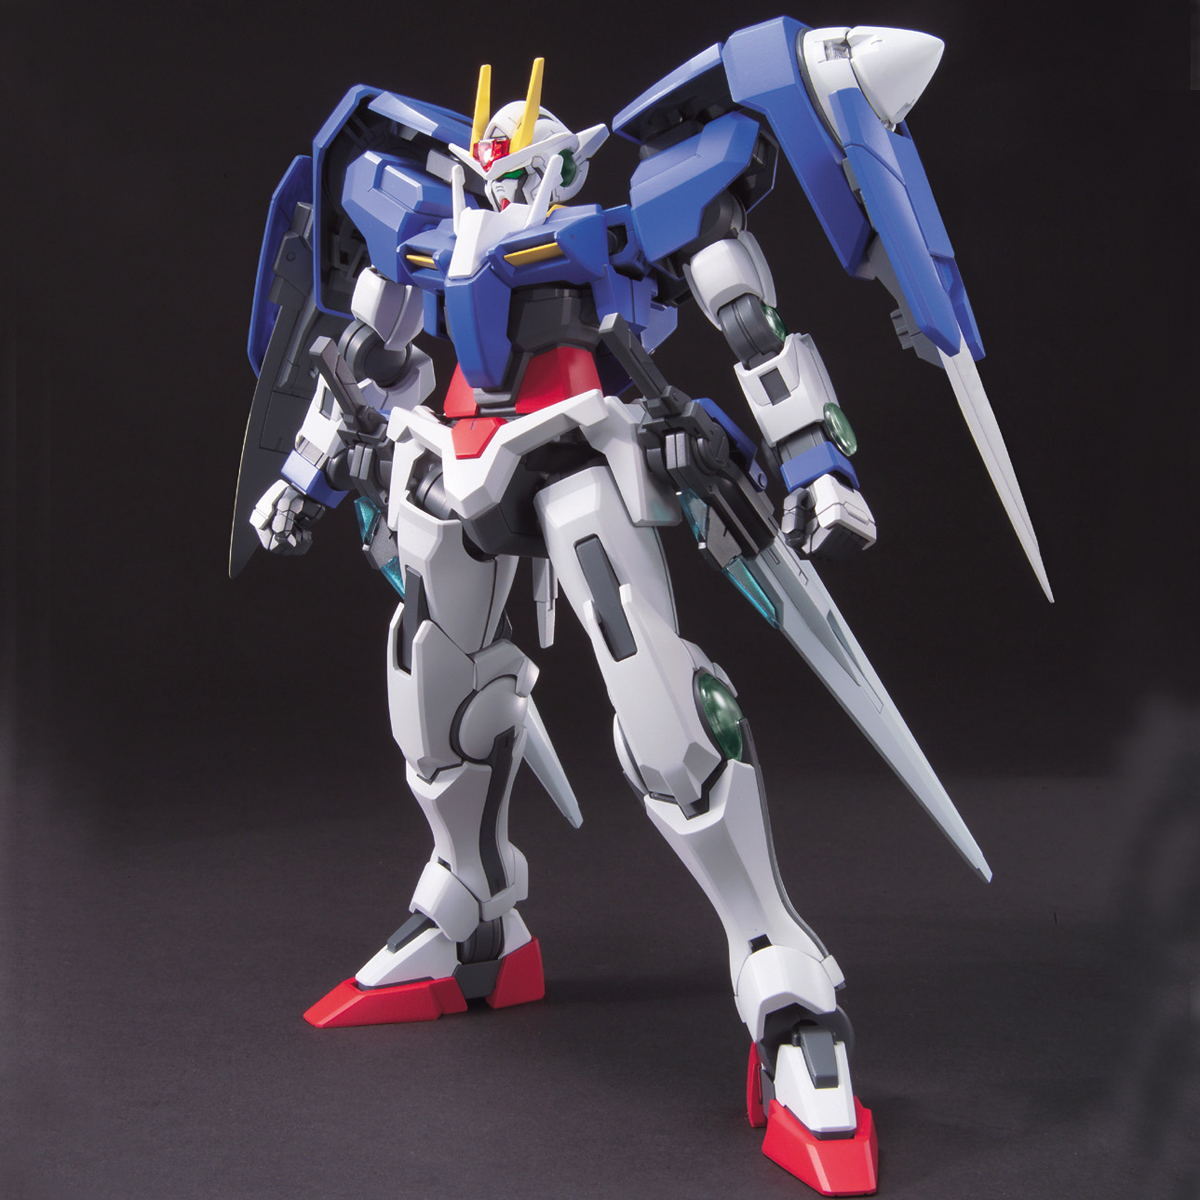 889711/100 GN-0000 ダブルオーガンダム [00 Gundam]